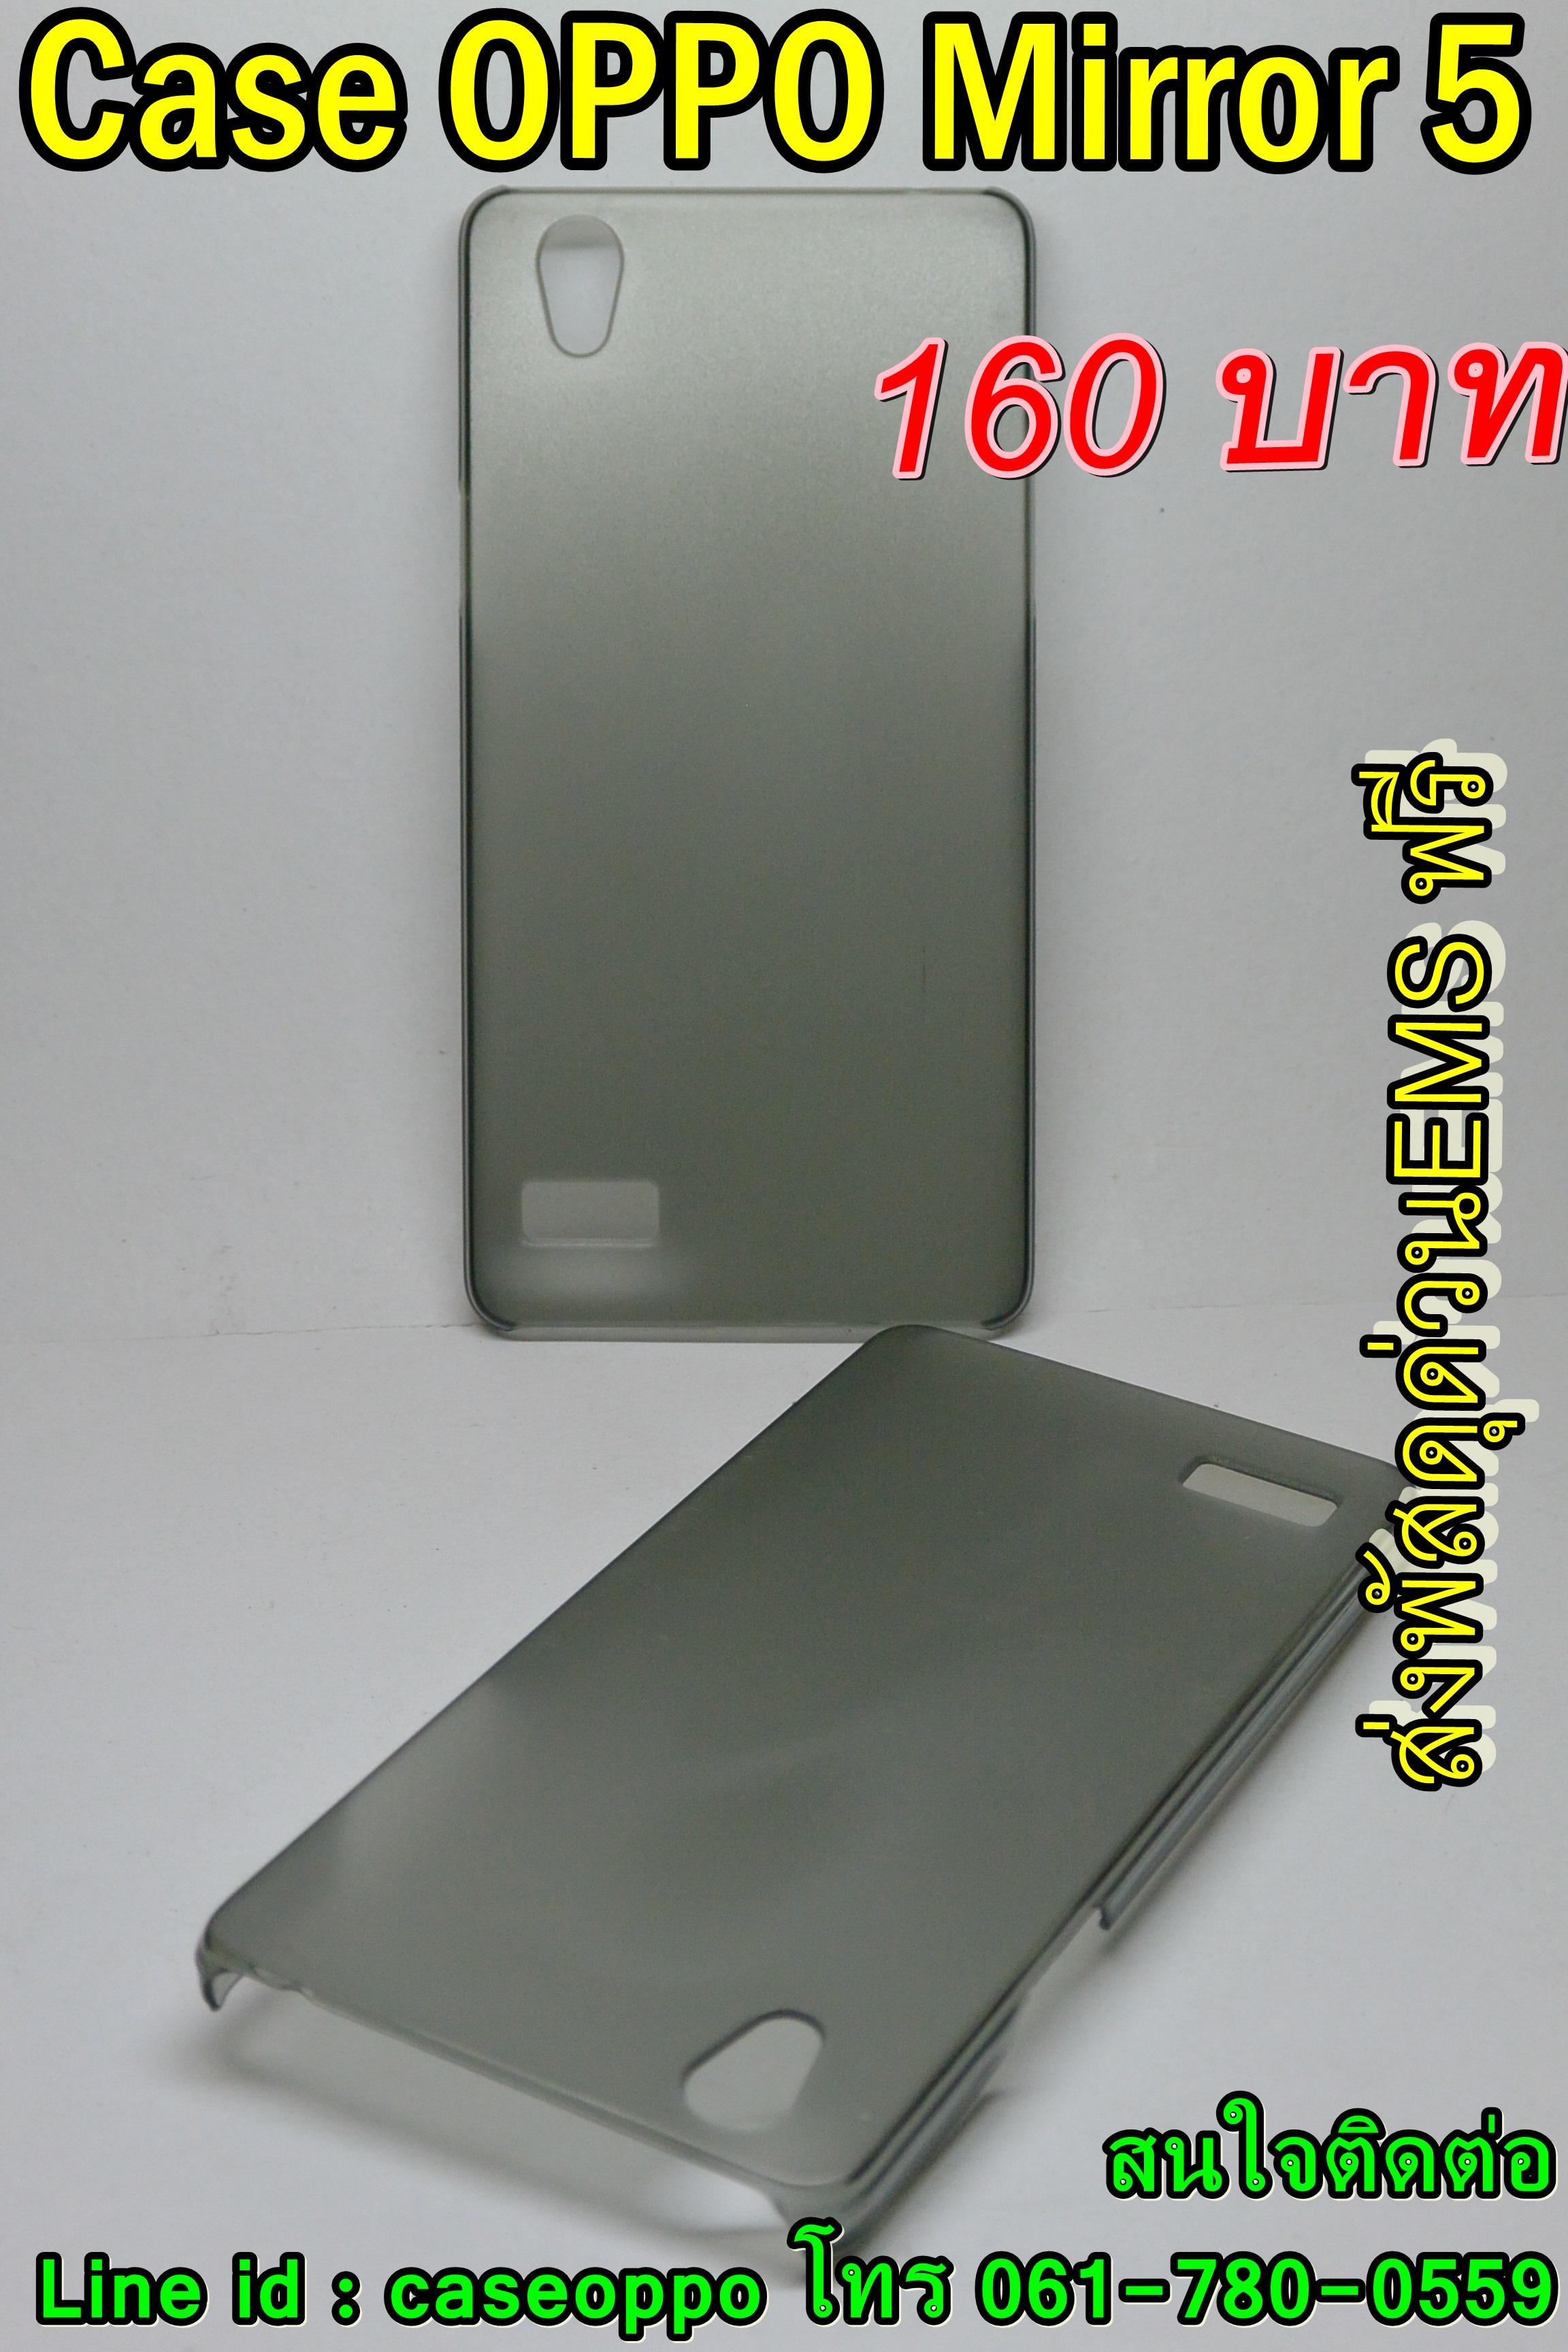 Case OPPO Mirror 5 ดำใสด้าน